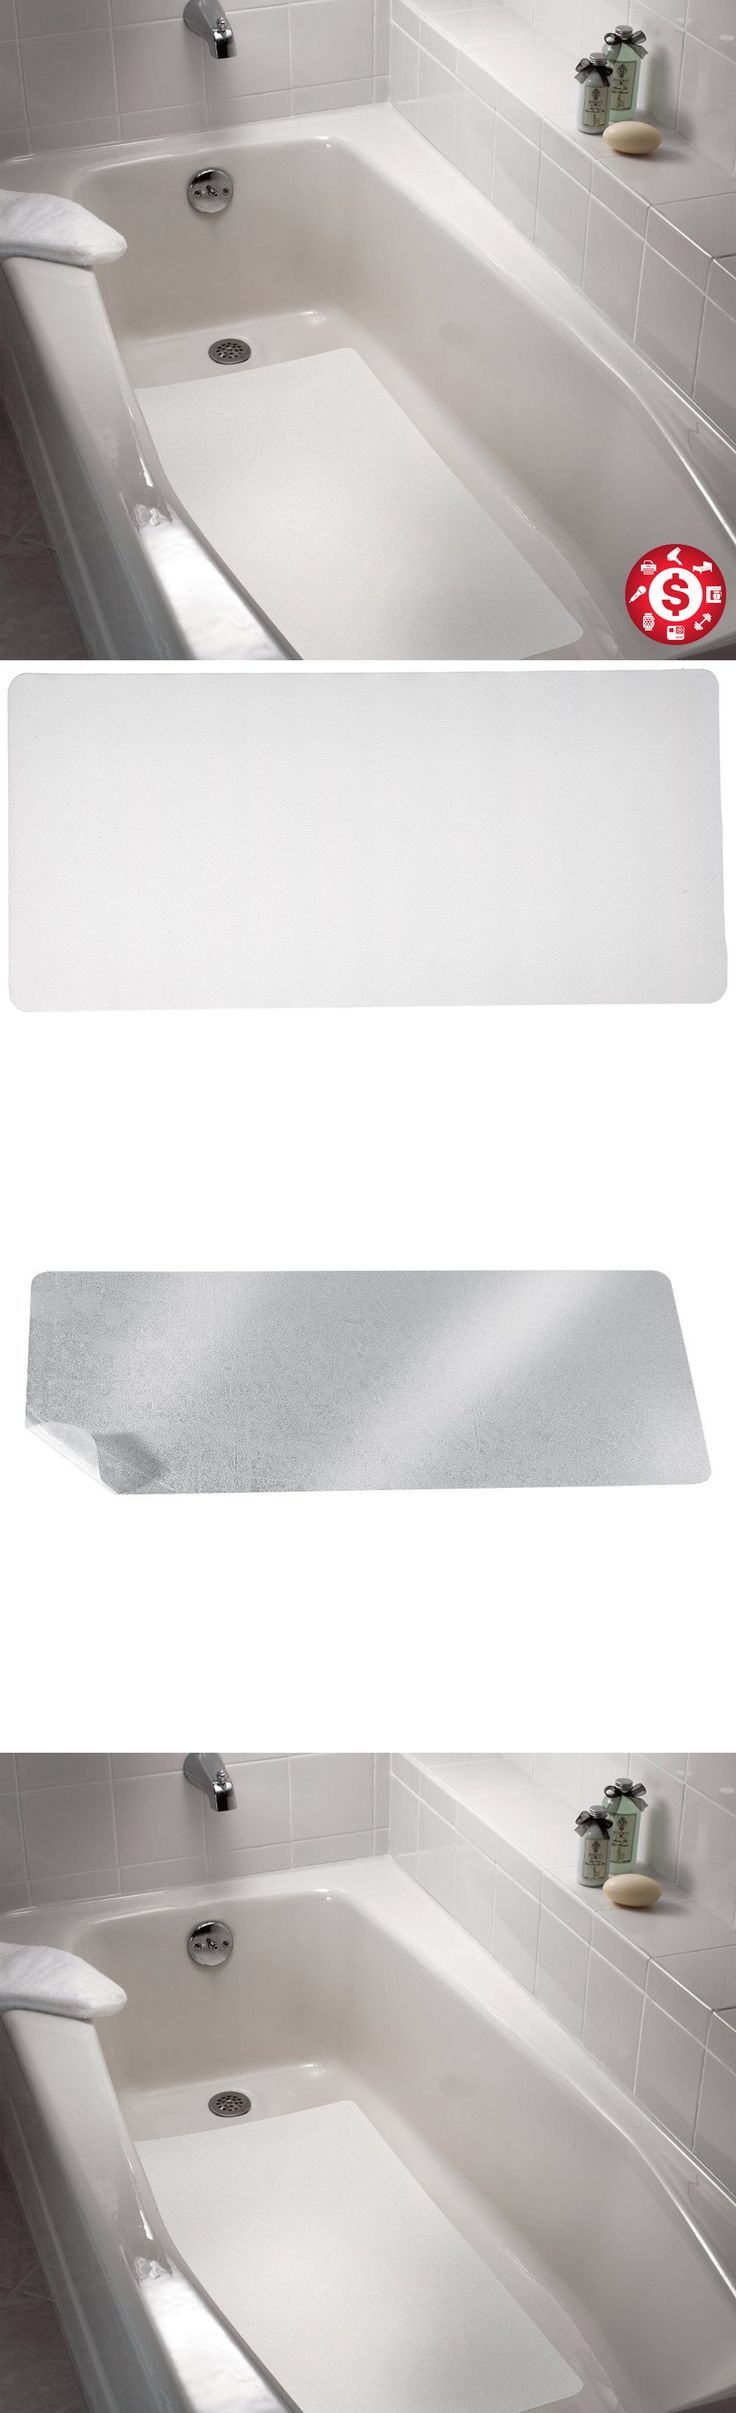 best 25 white anti slip mats ideas on pinterest black anti slip non slip appliques and mats 66722 extra long white bath mat anti skid adhesive